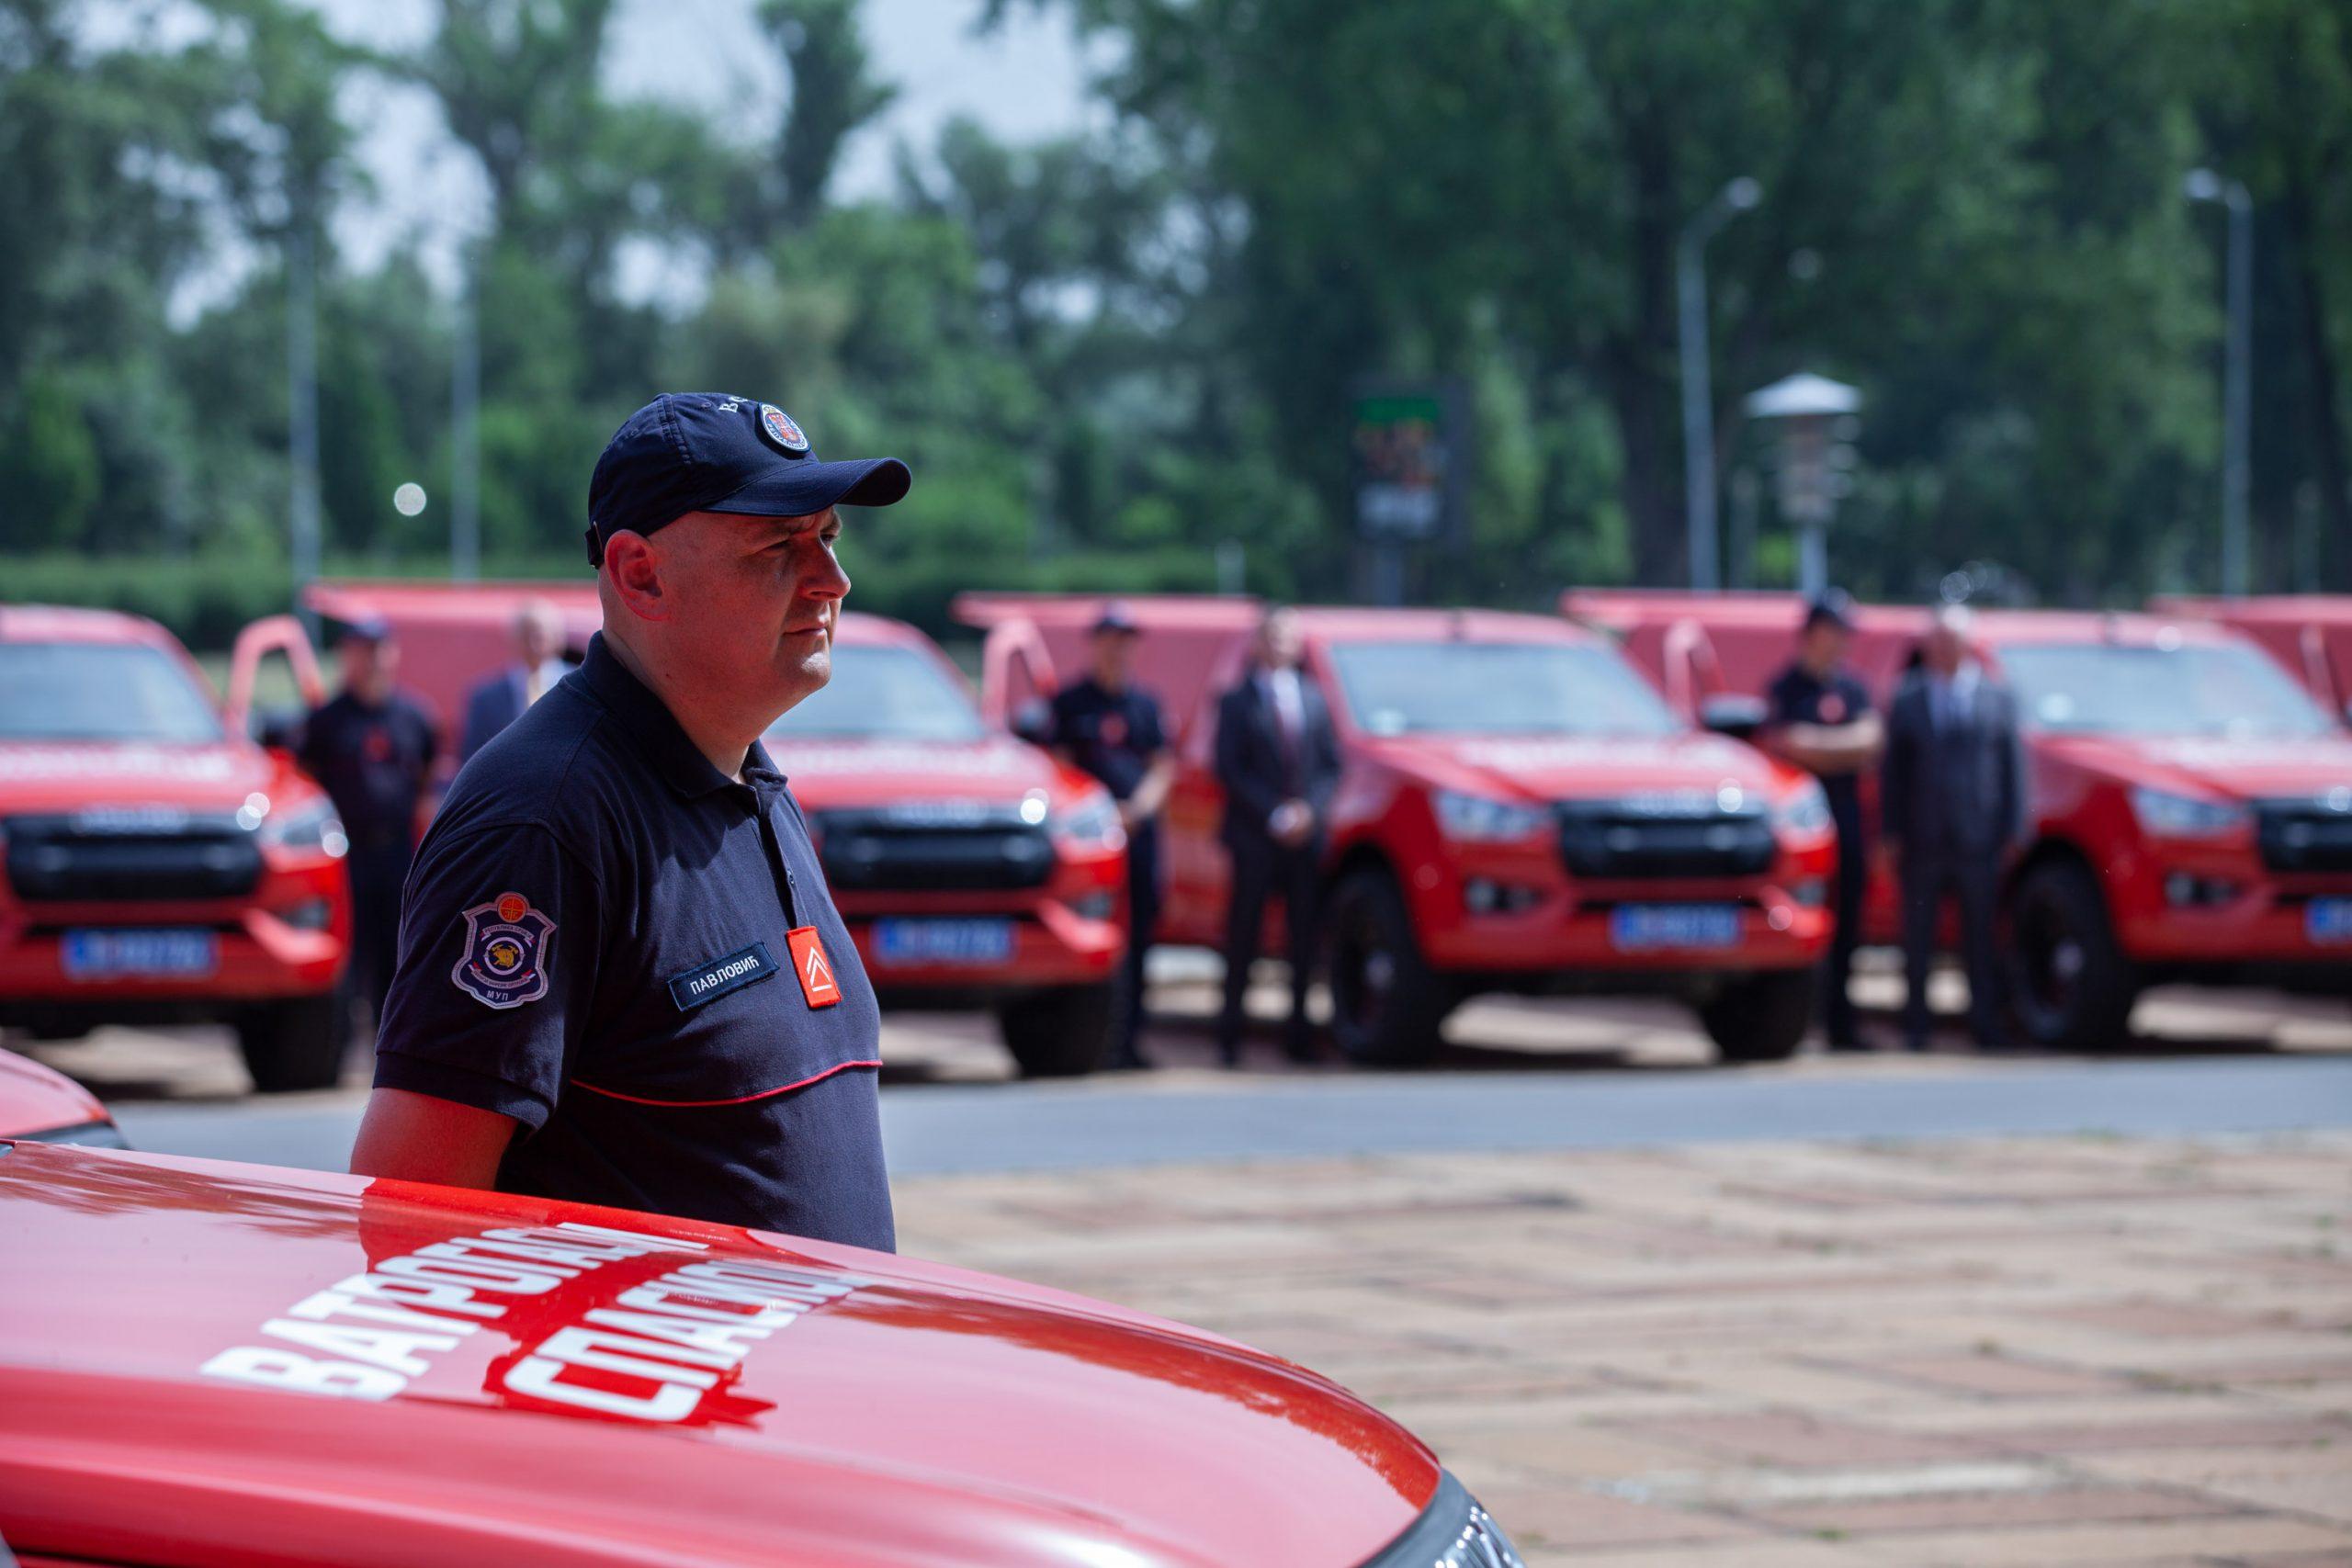 EU obezbedila 27 vozila za gašenje šumskih požara 4